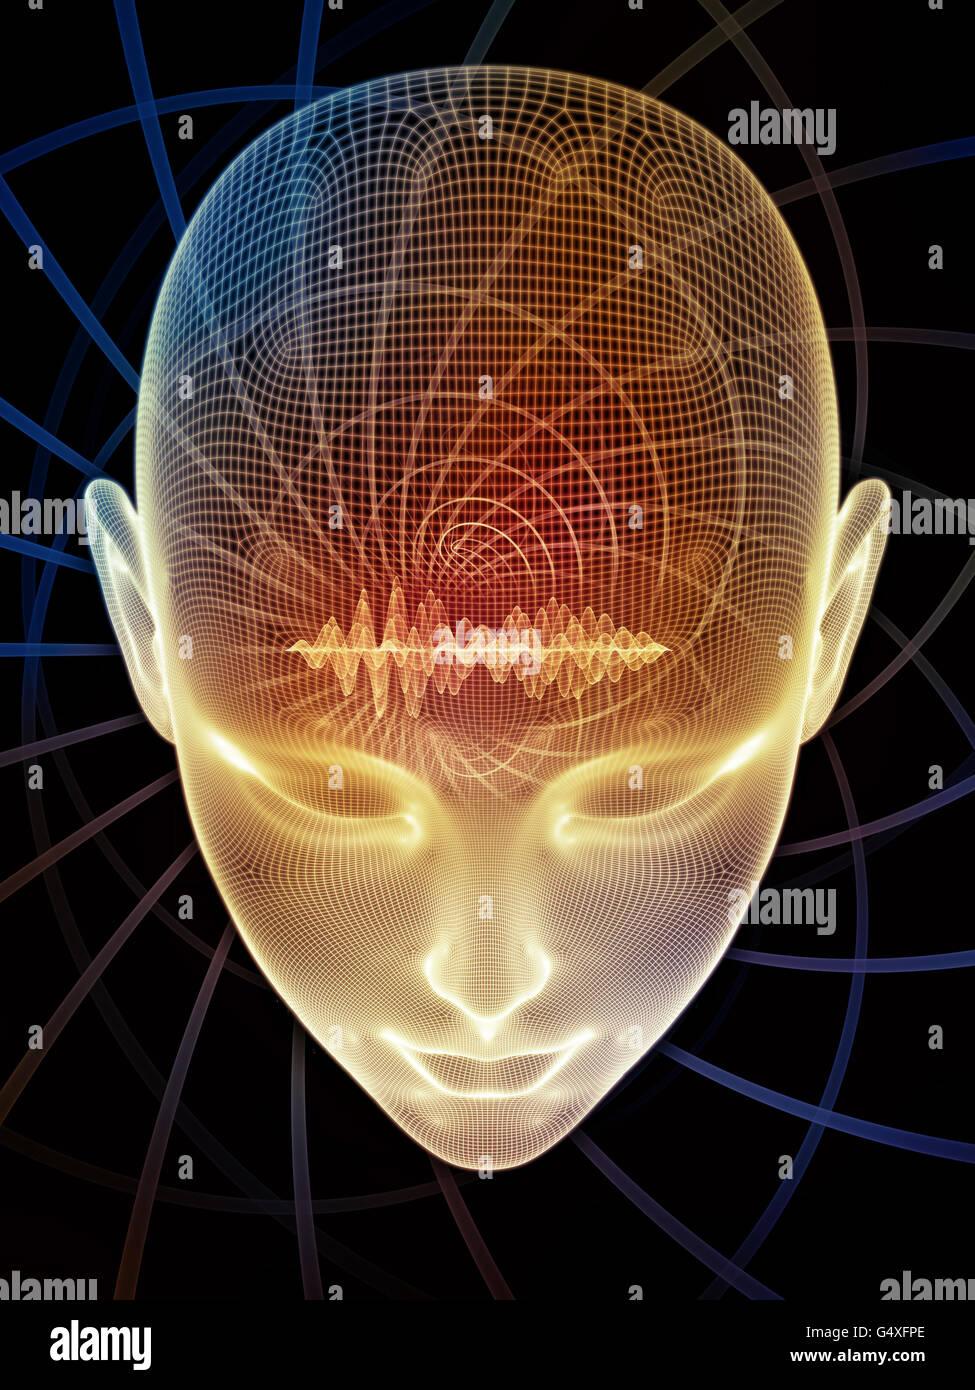 Visión en mente series. Composición de cabeza humana de renderizado y elemento conceptual adecuado como Imagen De Stock